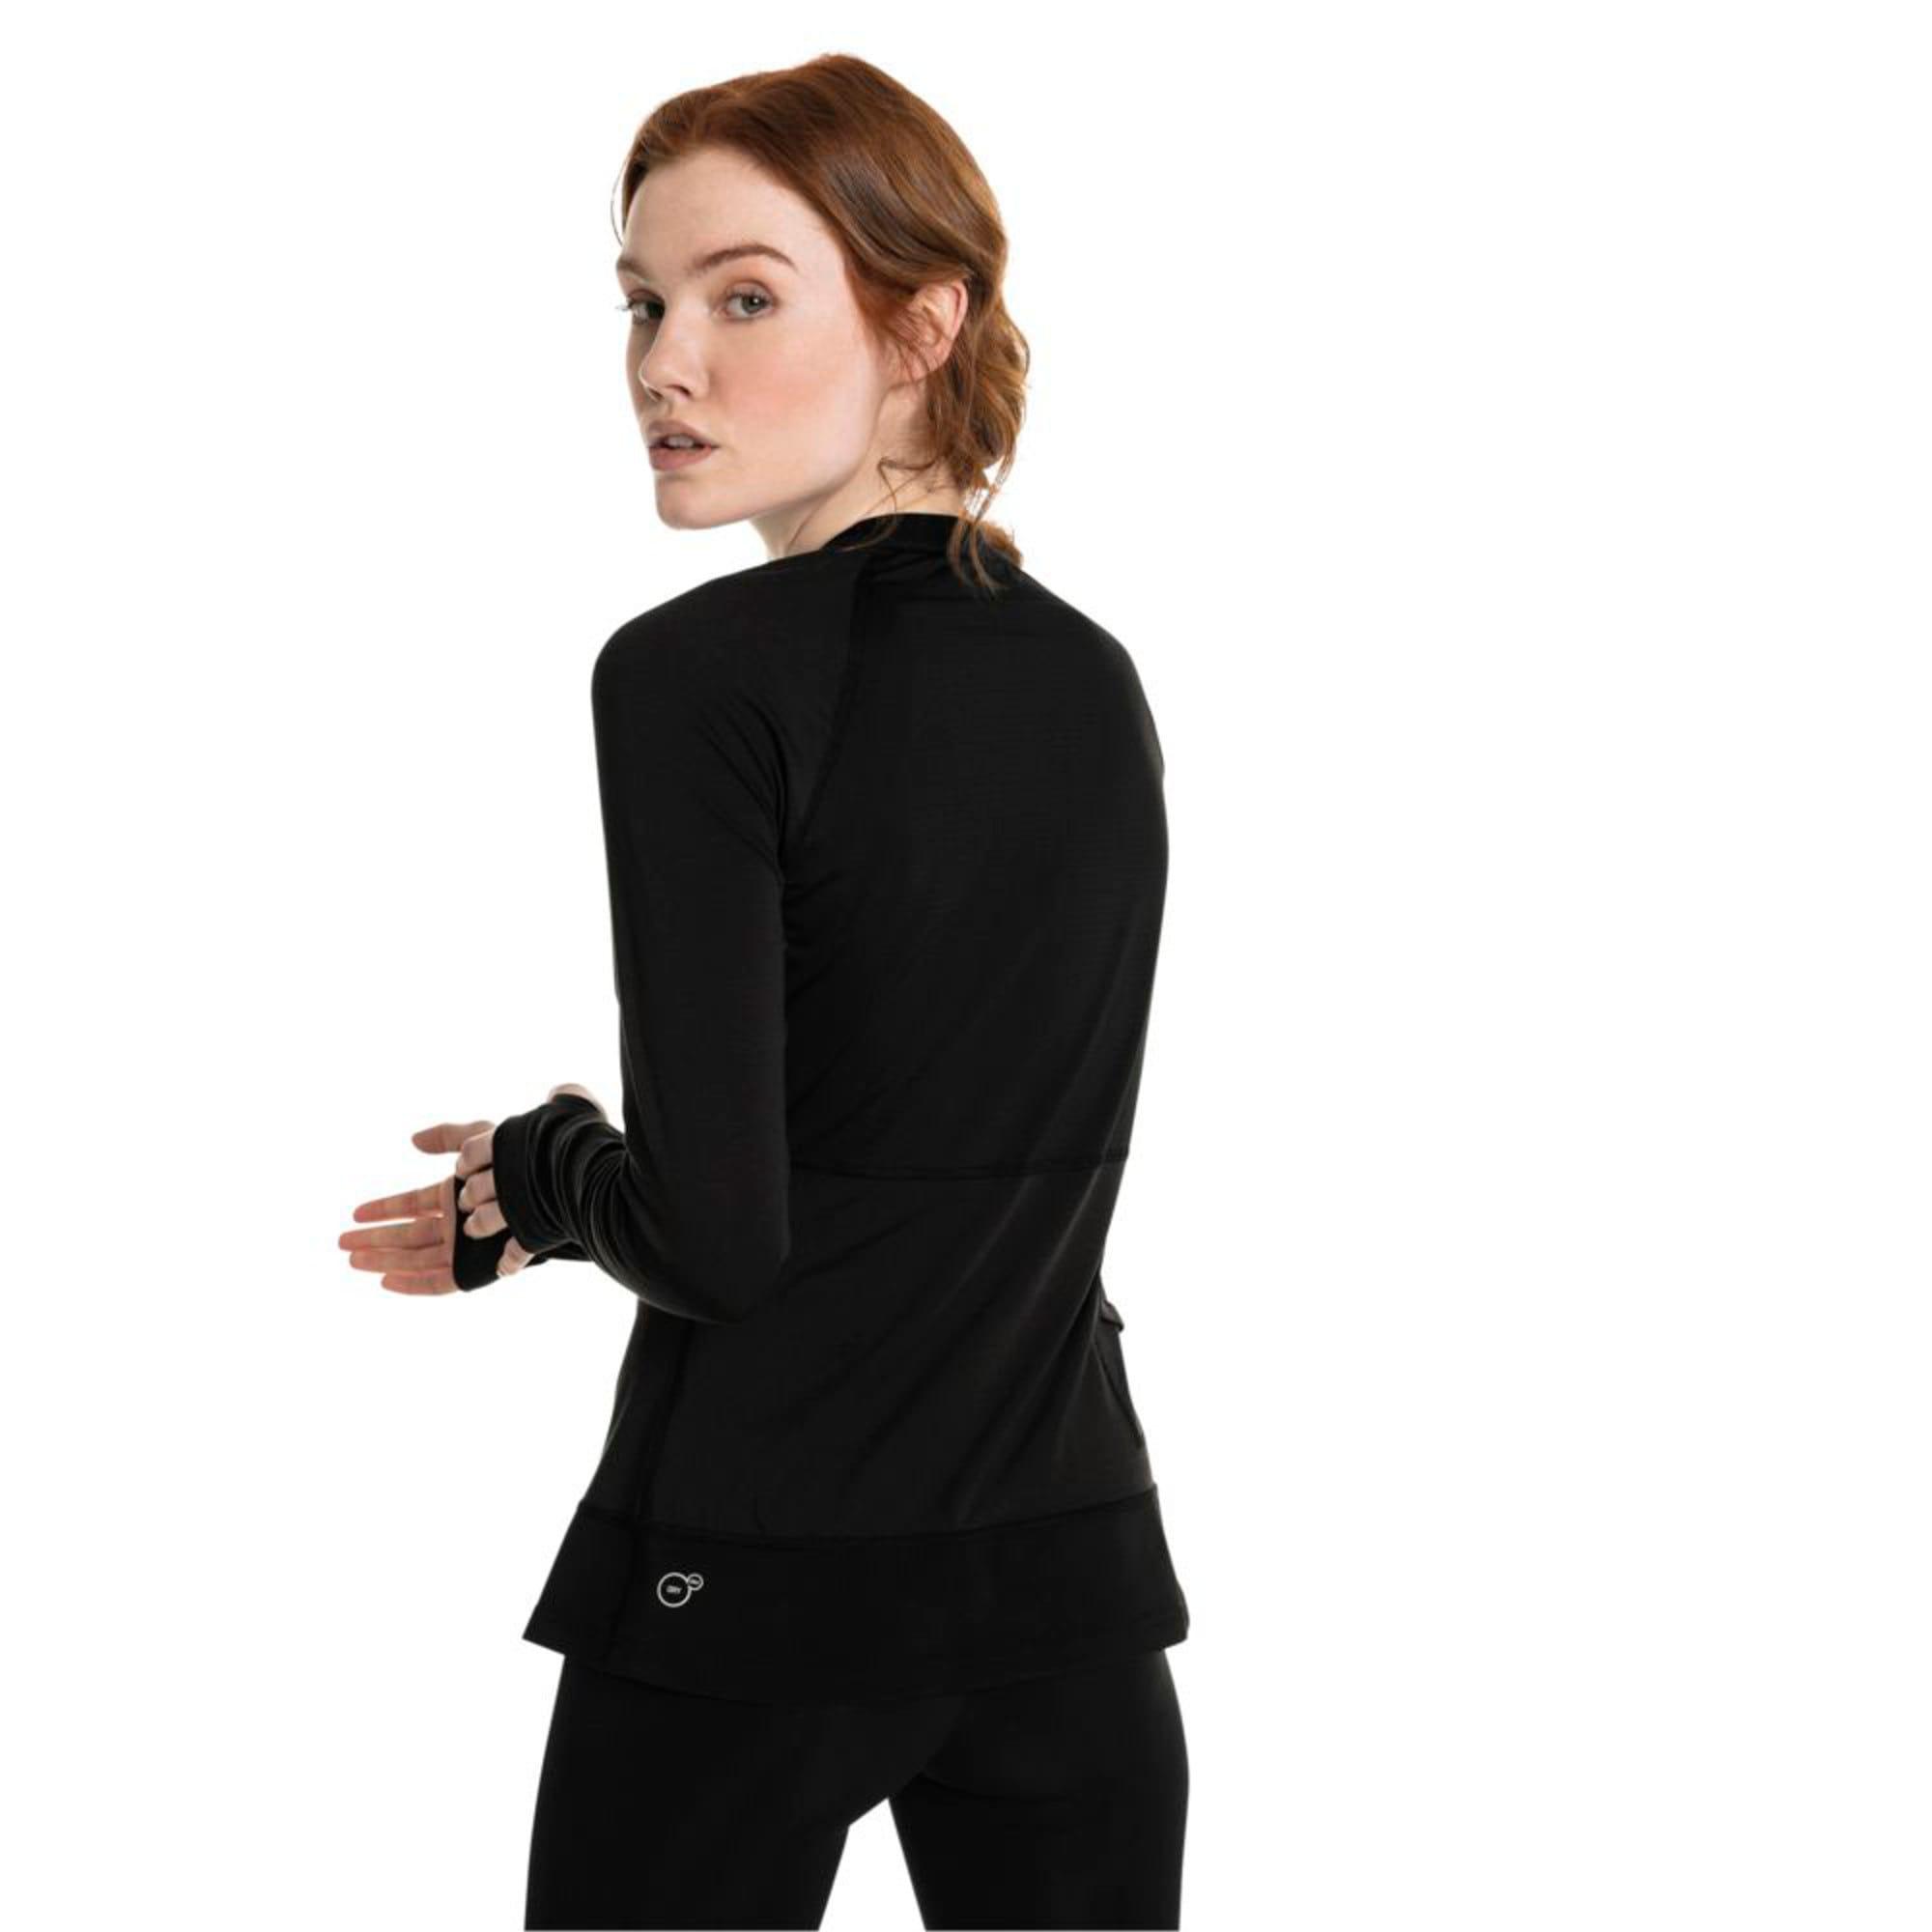 Thumbnail 4 of Winter Long Sleeve Women's Training Top, Puma Black, medium-IND